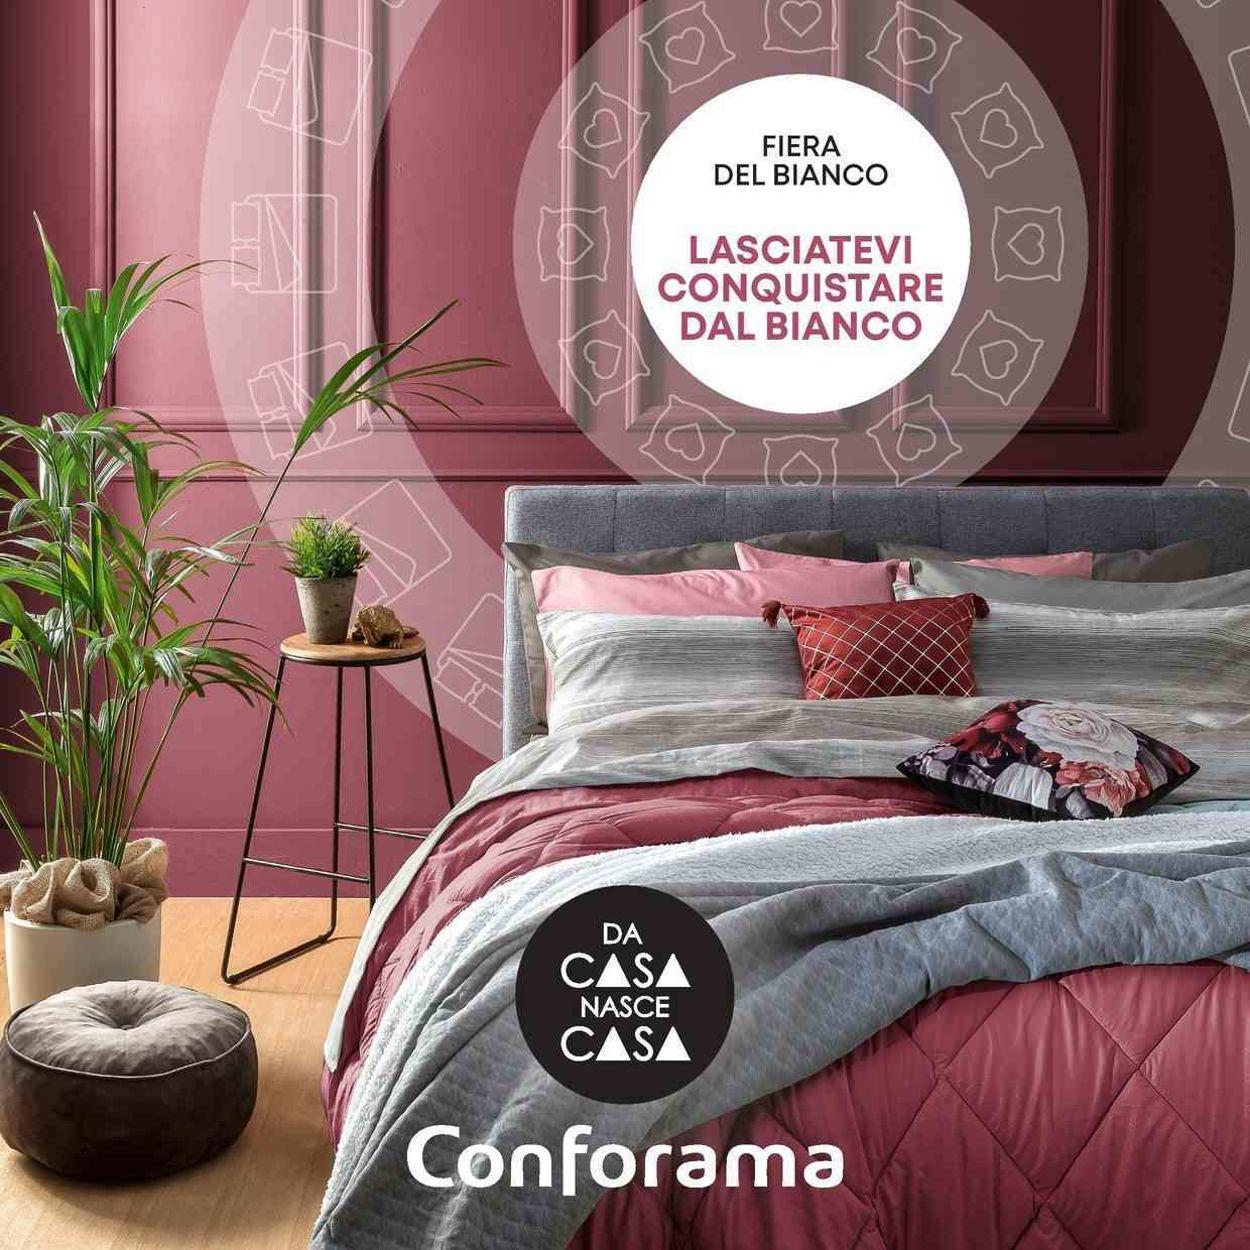 Volantino Conforama - Natale 2020 - Offerte 14/12-31/12/2020